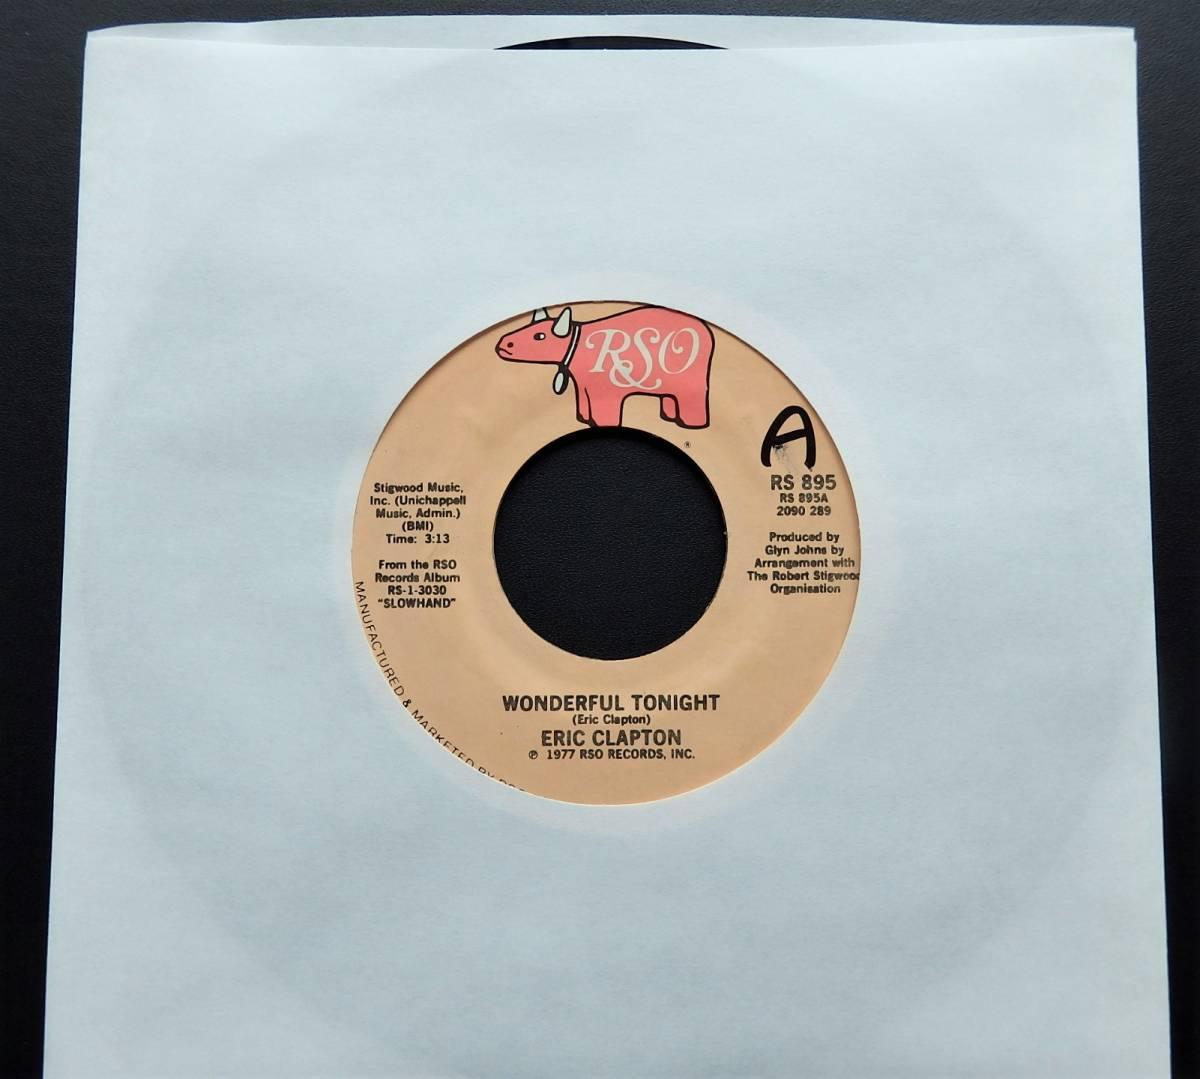 【USオリジナル7インチEP/4枚まとめて送料無料/1977年盤】ERIC CLAPTON/Wonderful Tonight b/w Peaches And Diesel_画像1